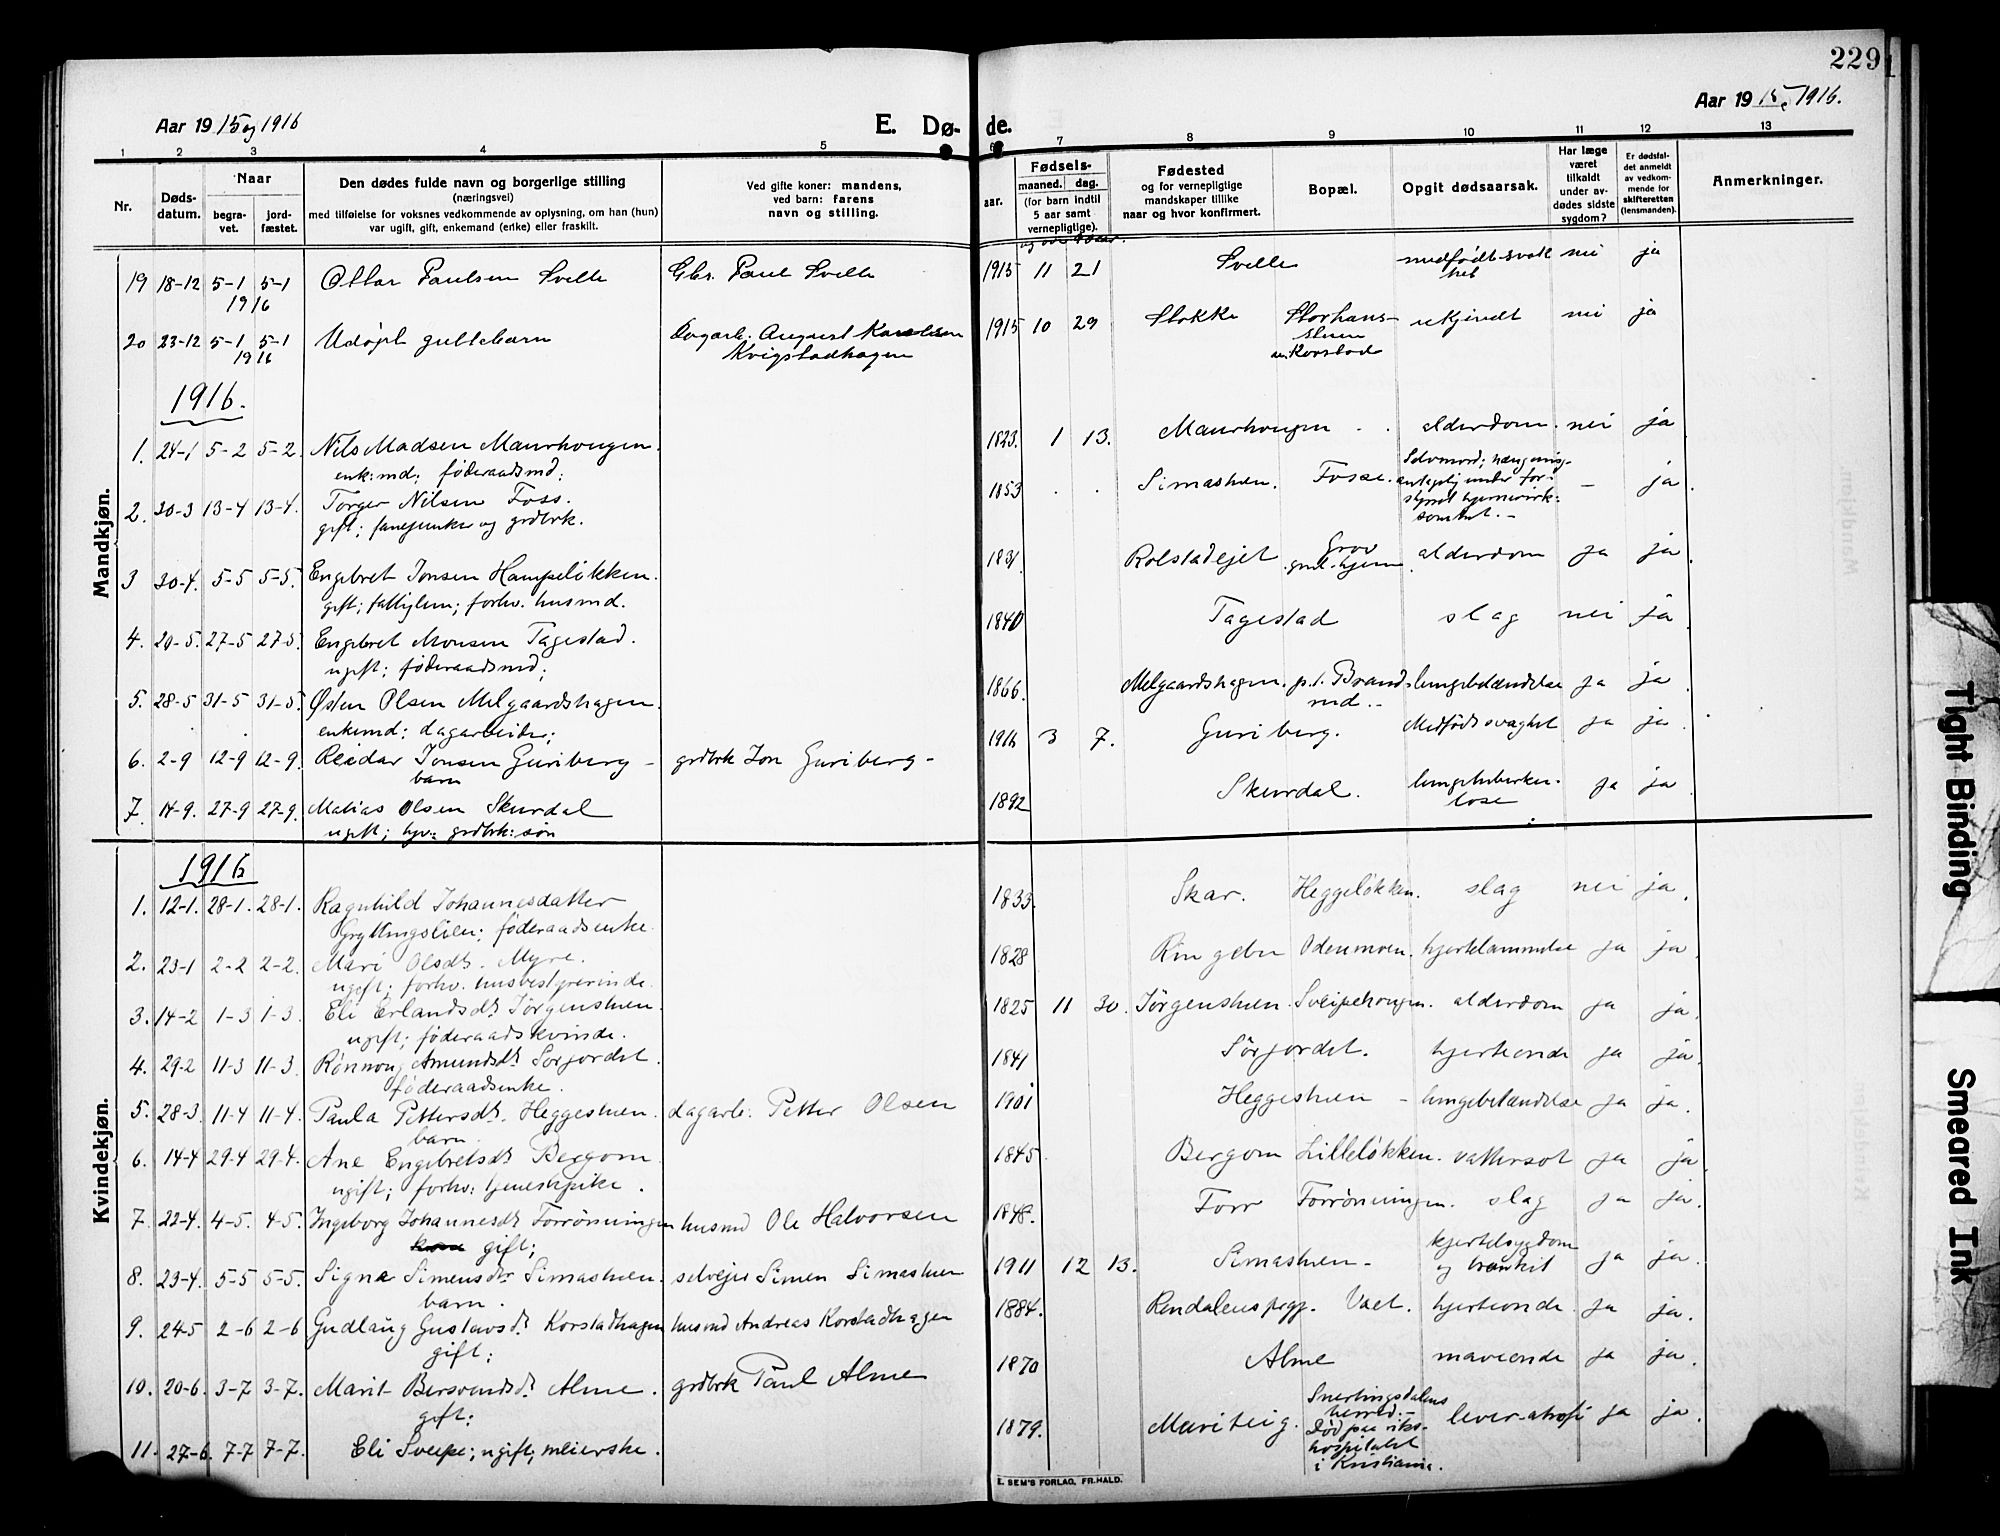 SAH, Sør-Fron prestekontor, H/Ha/Hab/L0005: Klokkerbok nr. 5, 1912-1930, s. 229